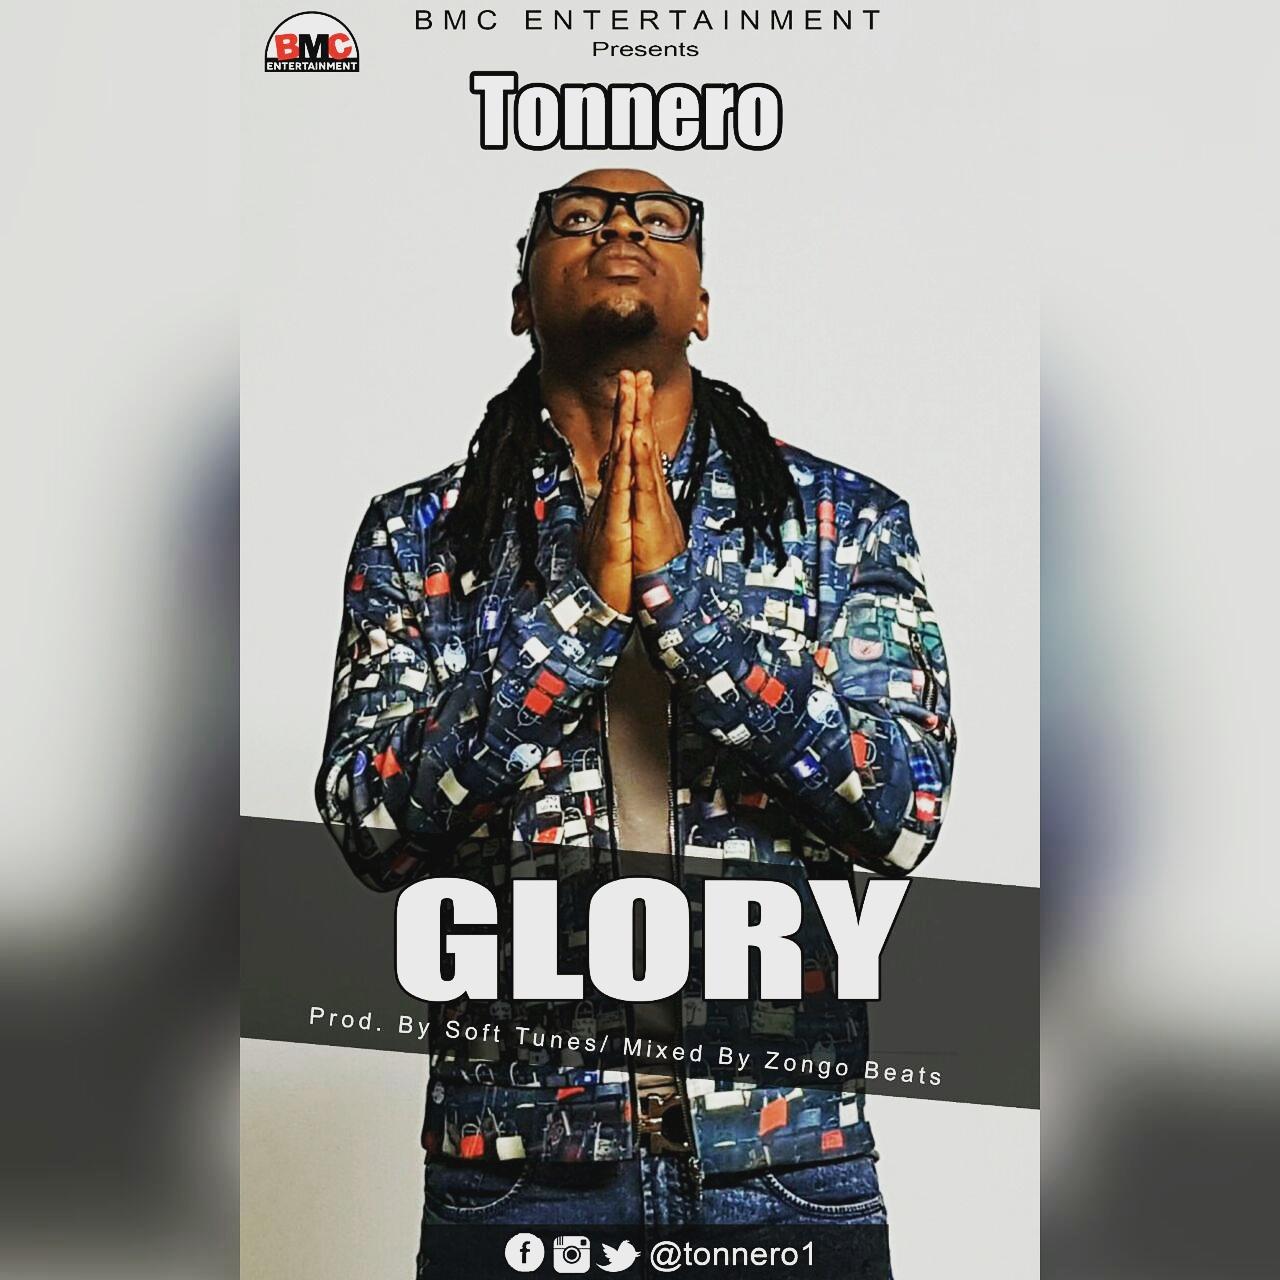 Tonnero - Glory